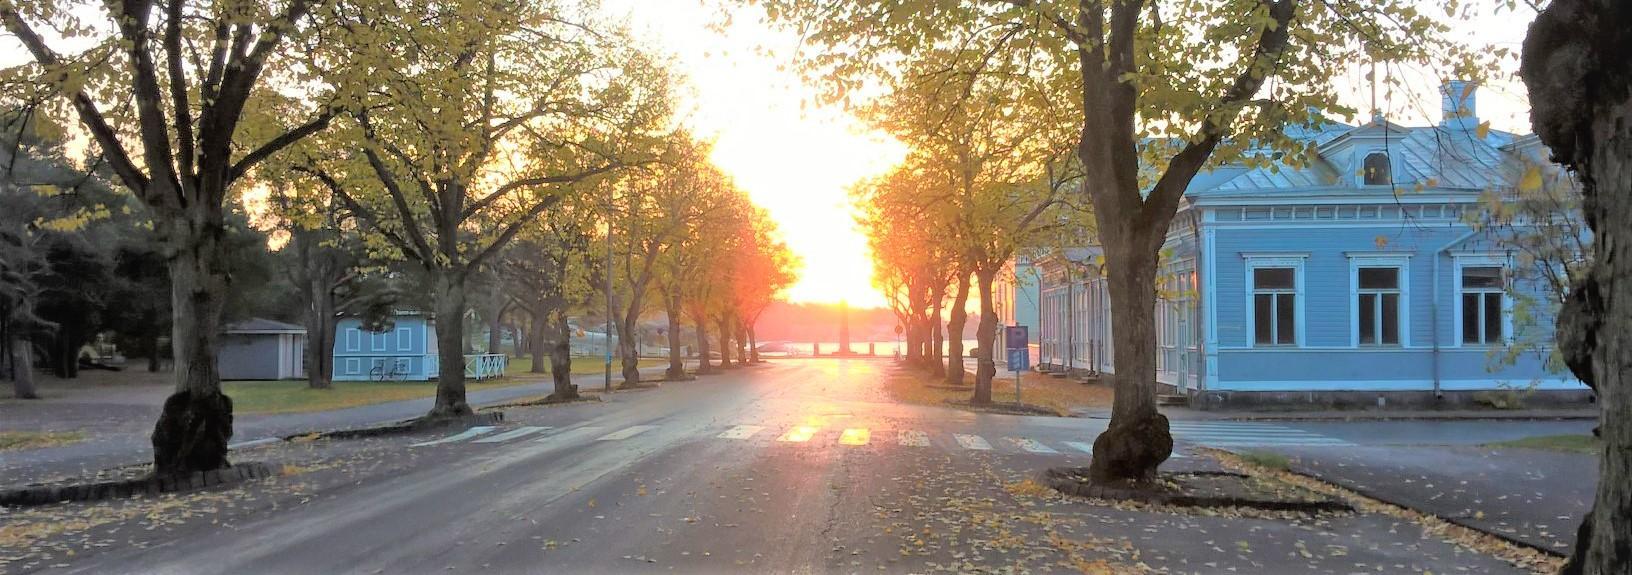 Auringonnousu ja Vapaudenpatsas Hangossa.